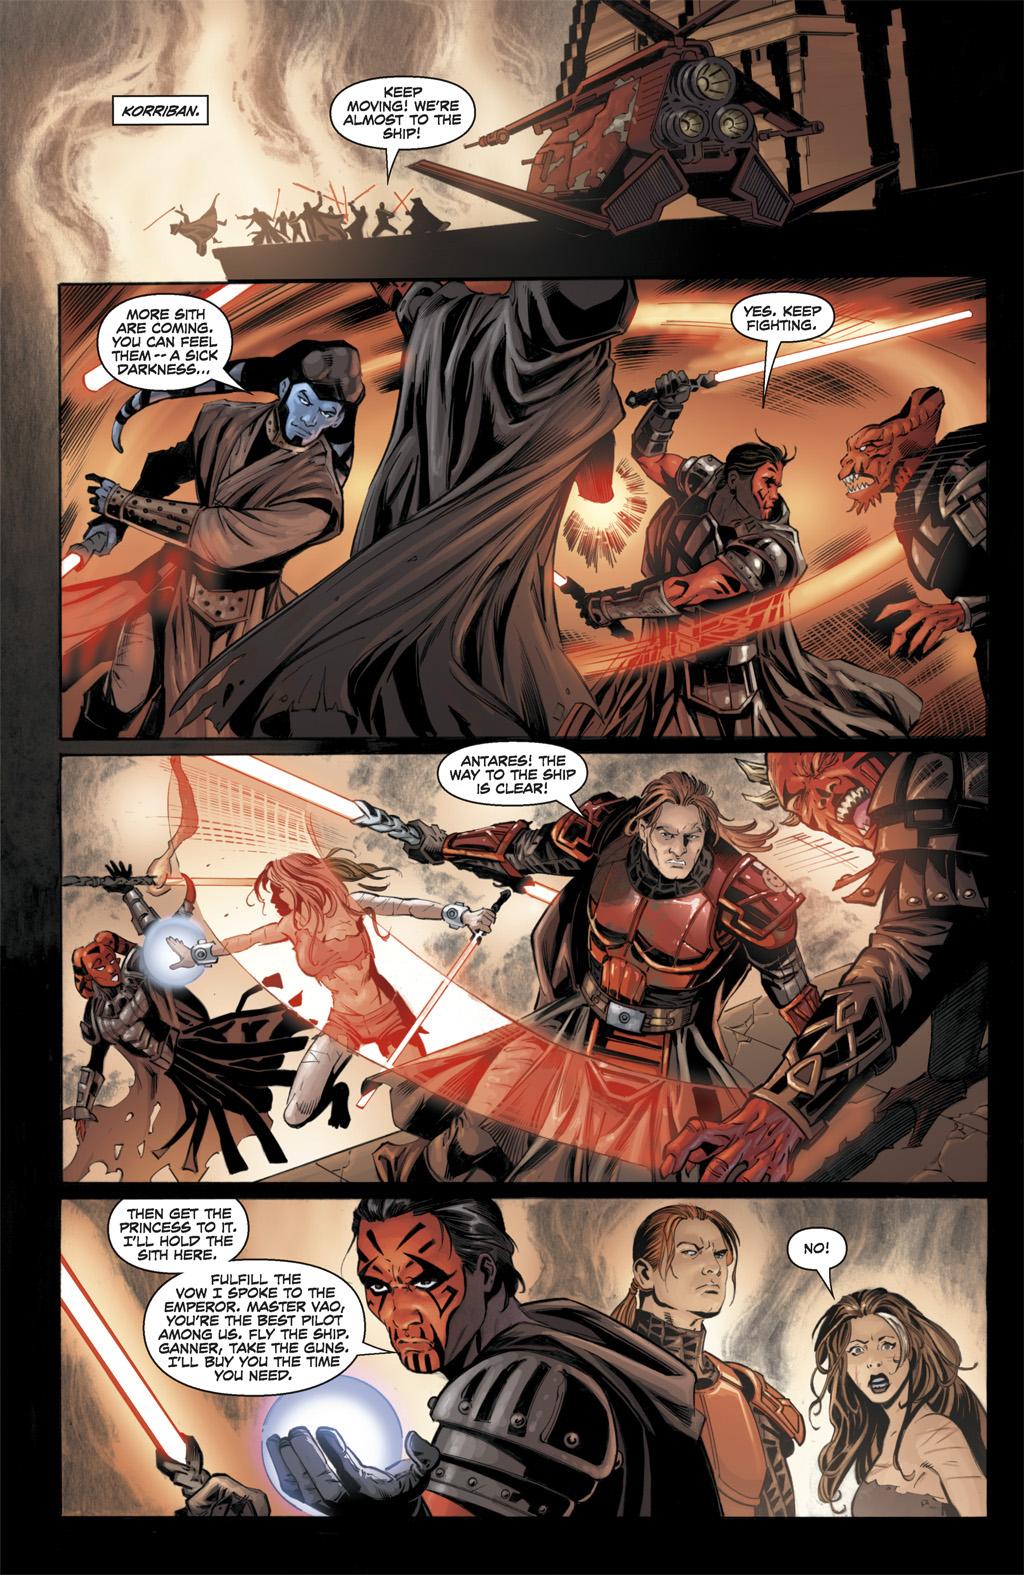 Antares Draco VS The One Sith